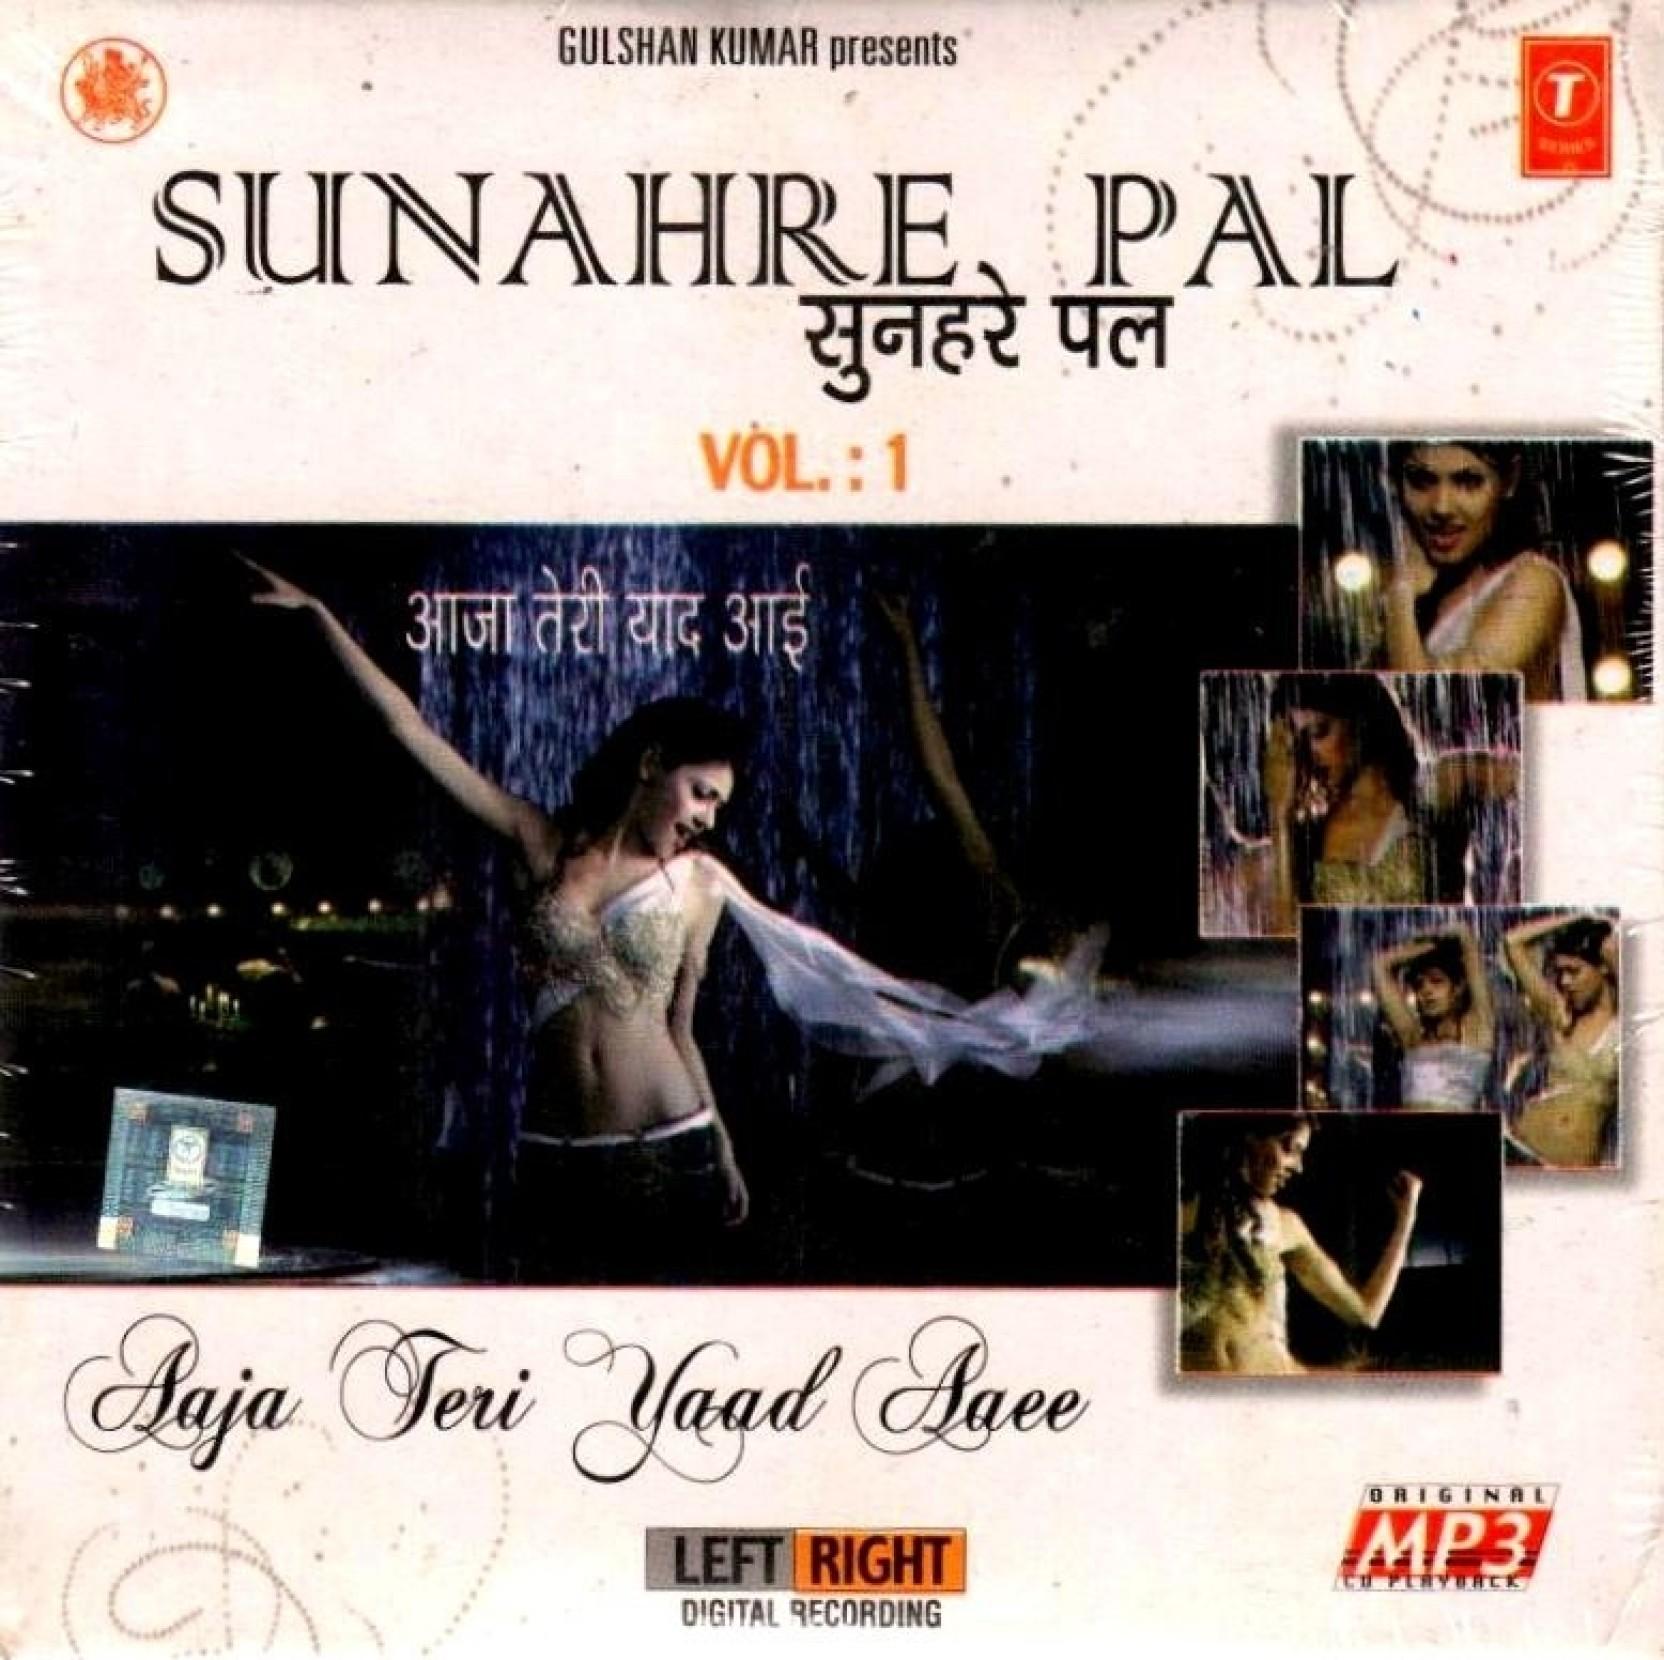 Pal Pal Yaad Teri Song Download: Sunehre Pal Vol.1 (Left Right Recording) Aaja Teri Yaad